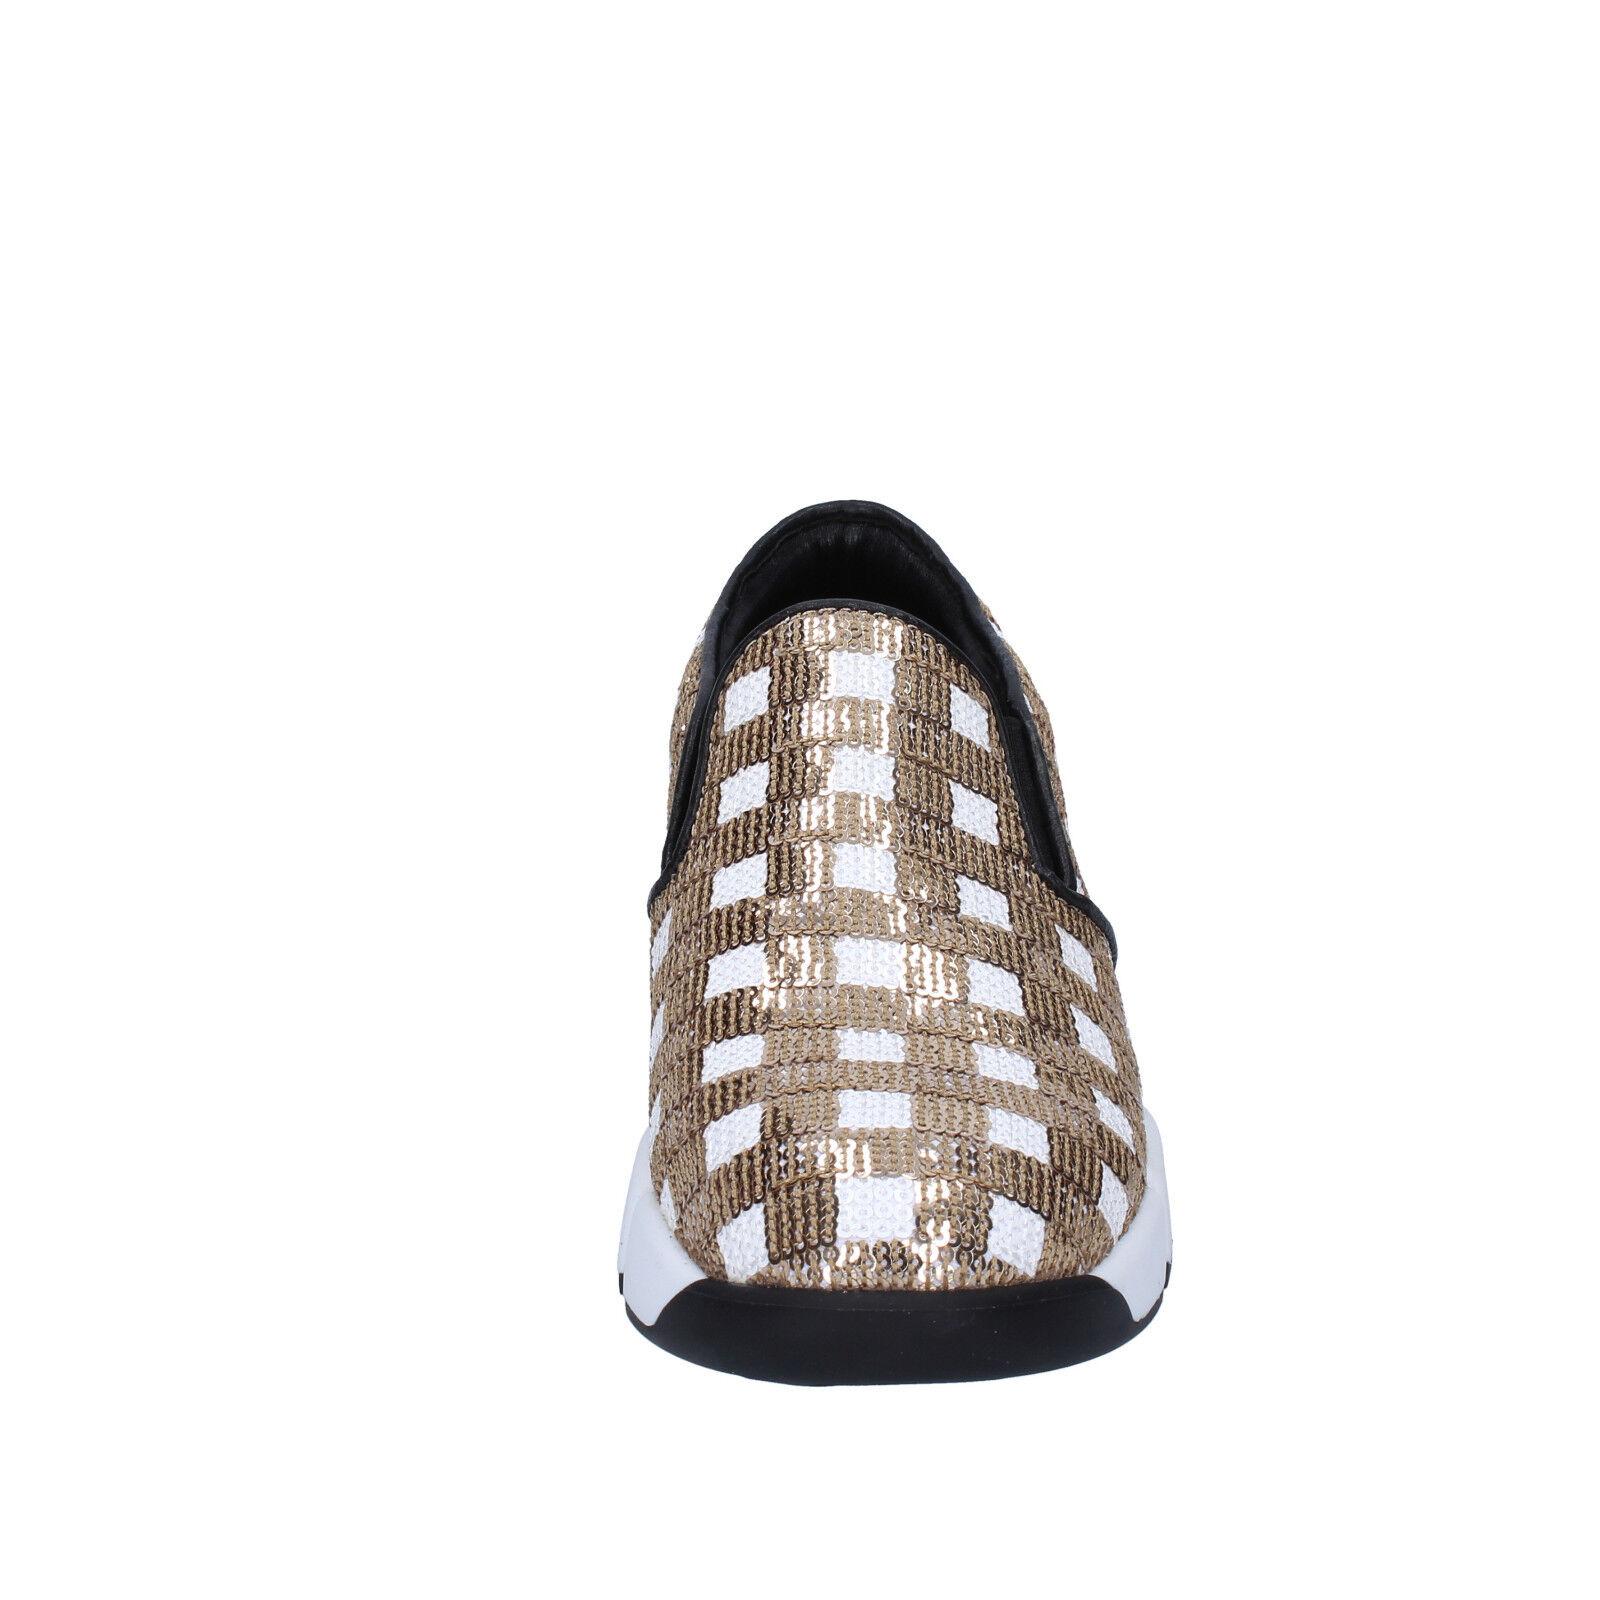 Scarpe Bianco DA DONNA PINKO 36 UE Slip on Bianco Scarpe Oro Paillettes bt250-36 e598cf